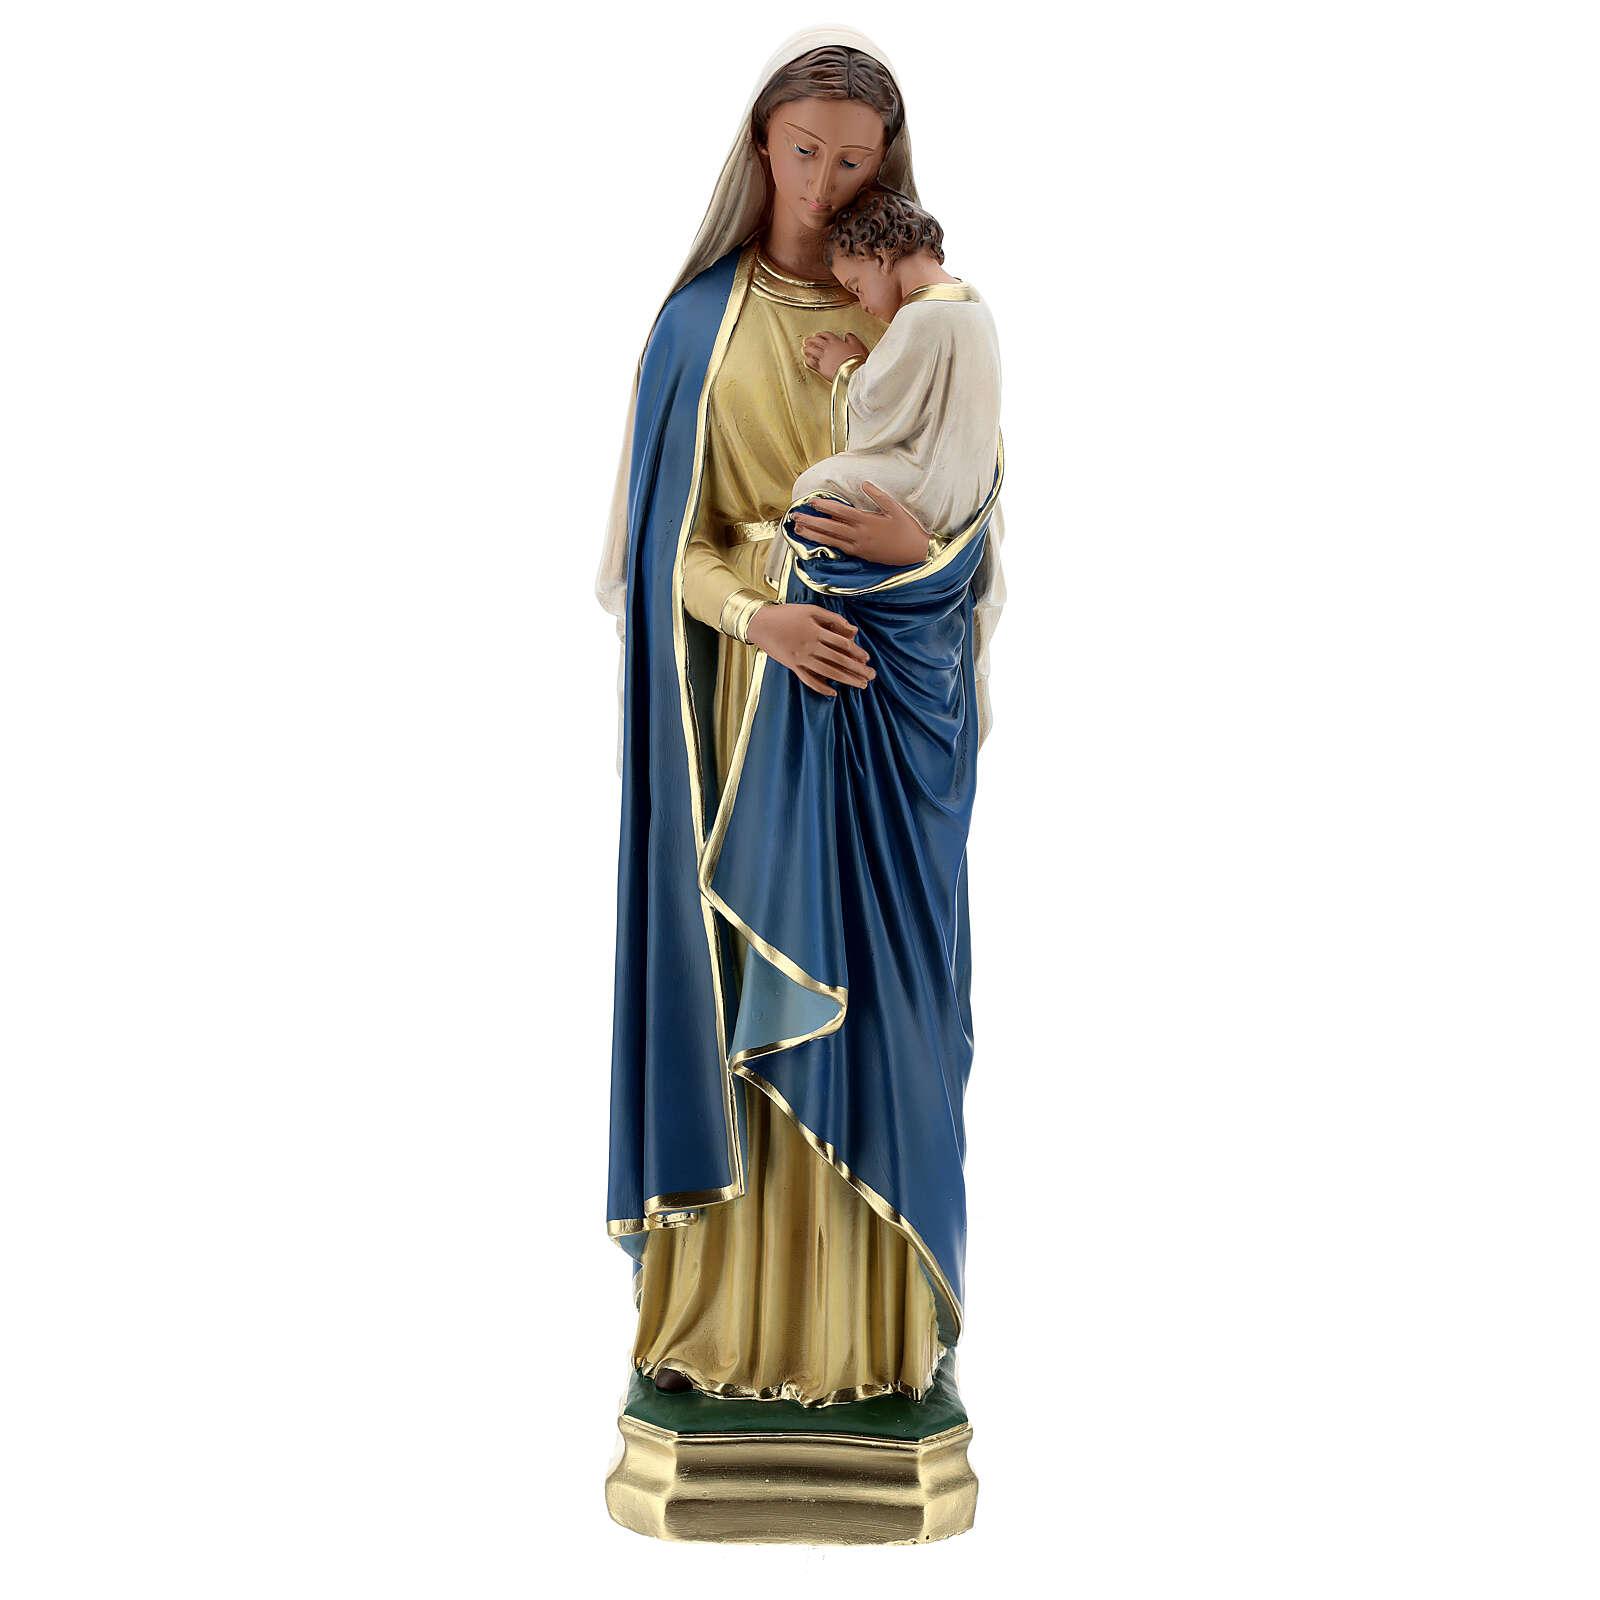 Virgen con Niño estatua yeso 60 cm pintada a mano Barsanti 4